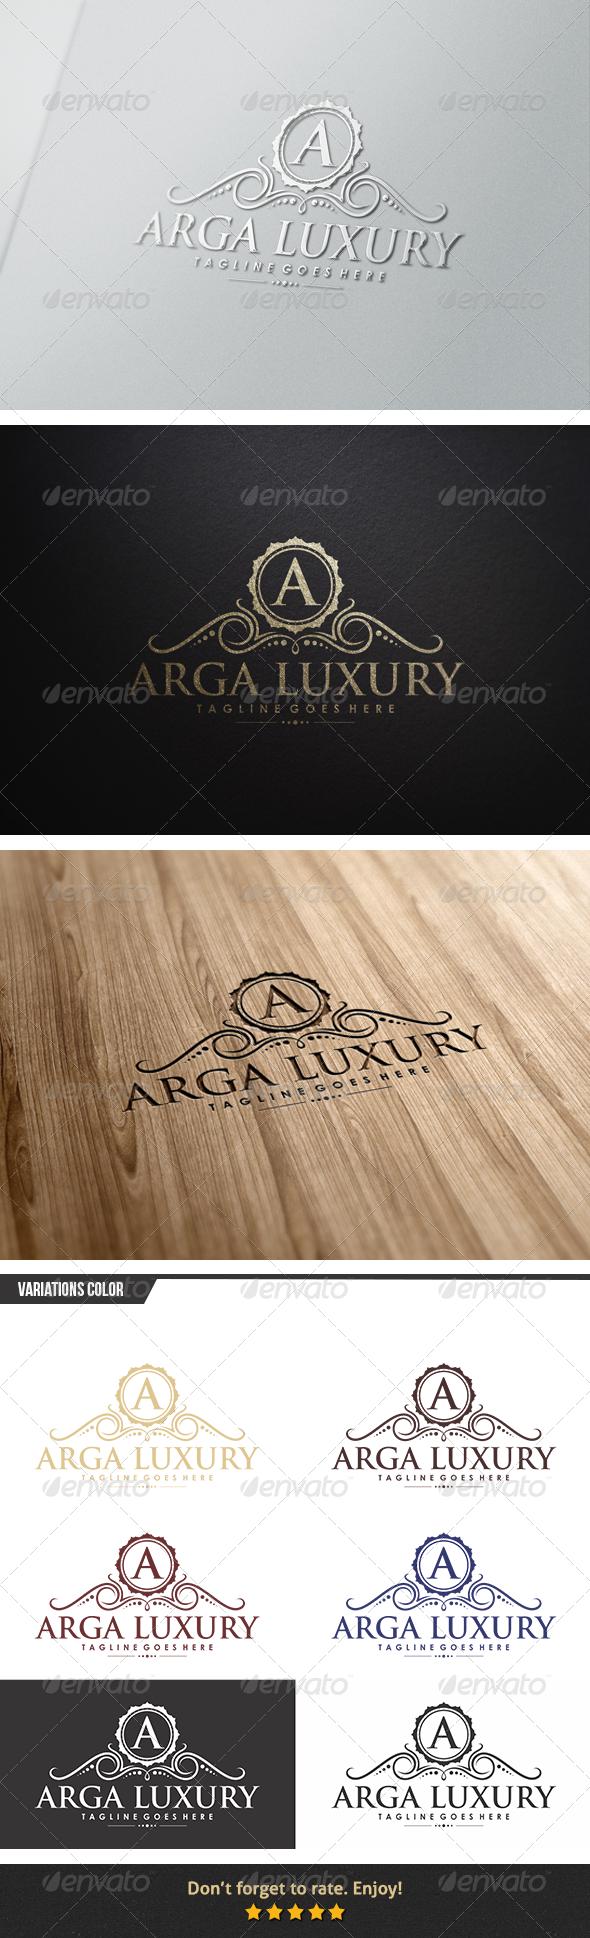 GraphicRiver Arga Luxury Logo 6153882